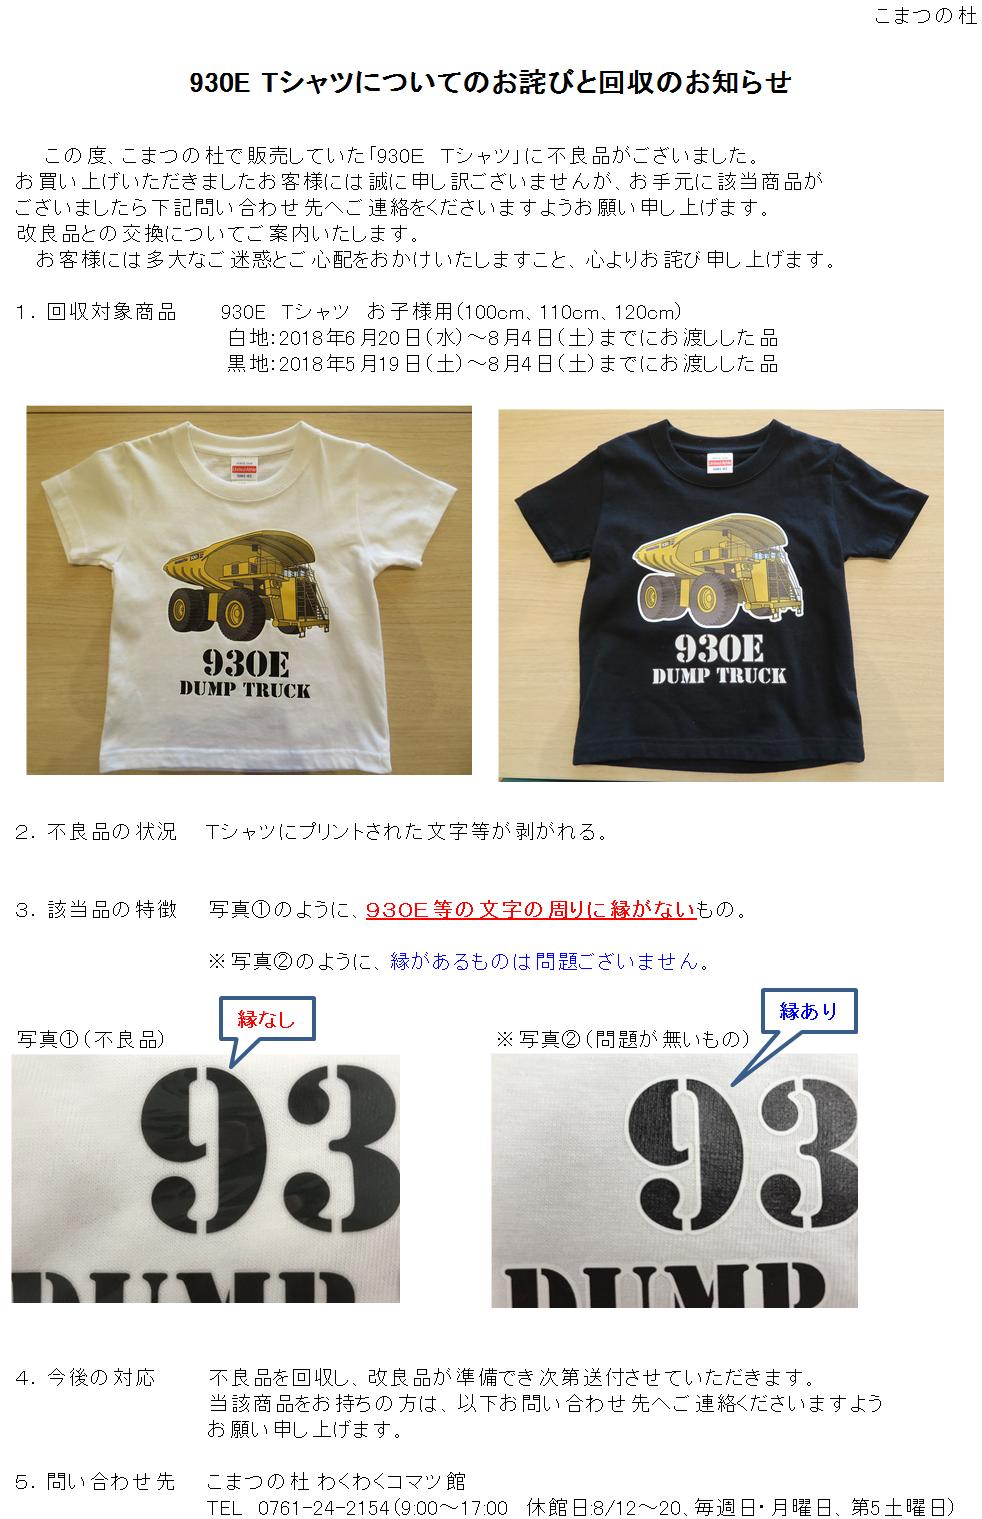 Tシャツ回収告知.png